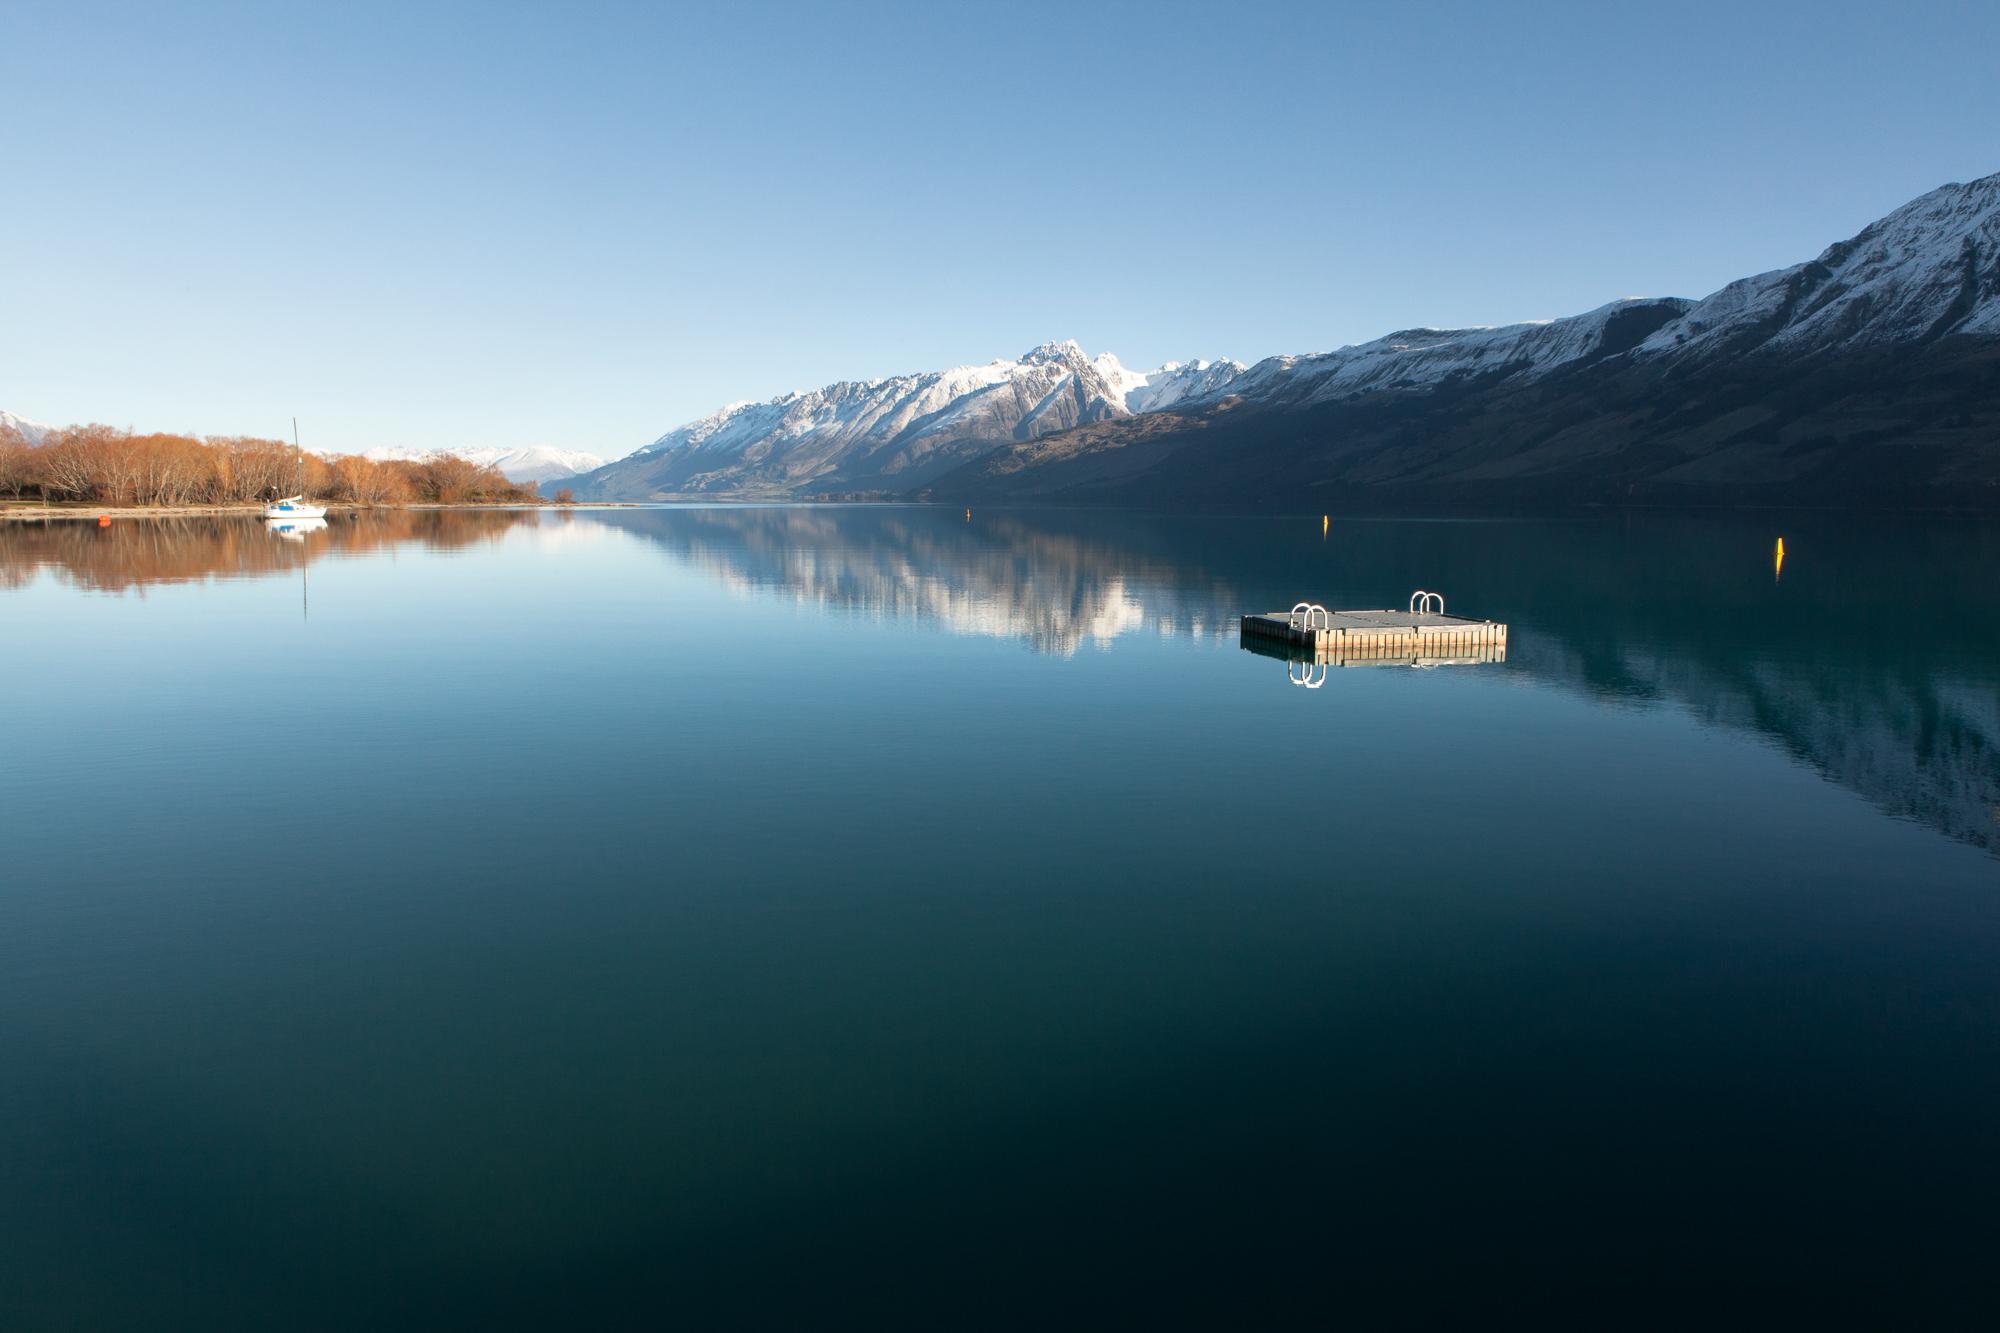 3-Bec_Kilpatrick_Photography_New_ZealandIMG_1692